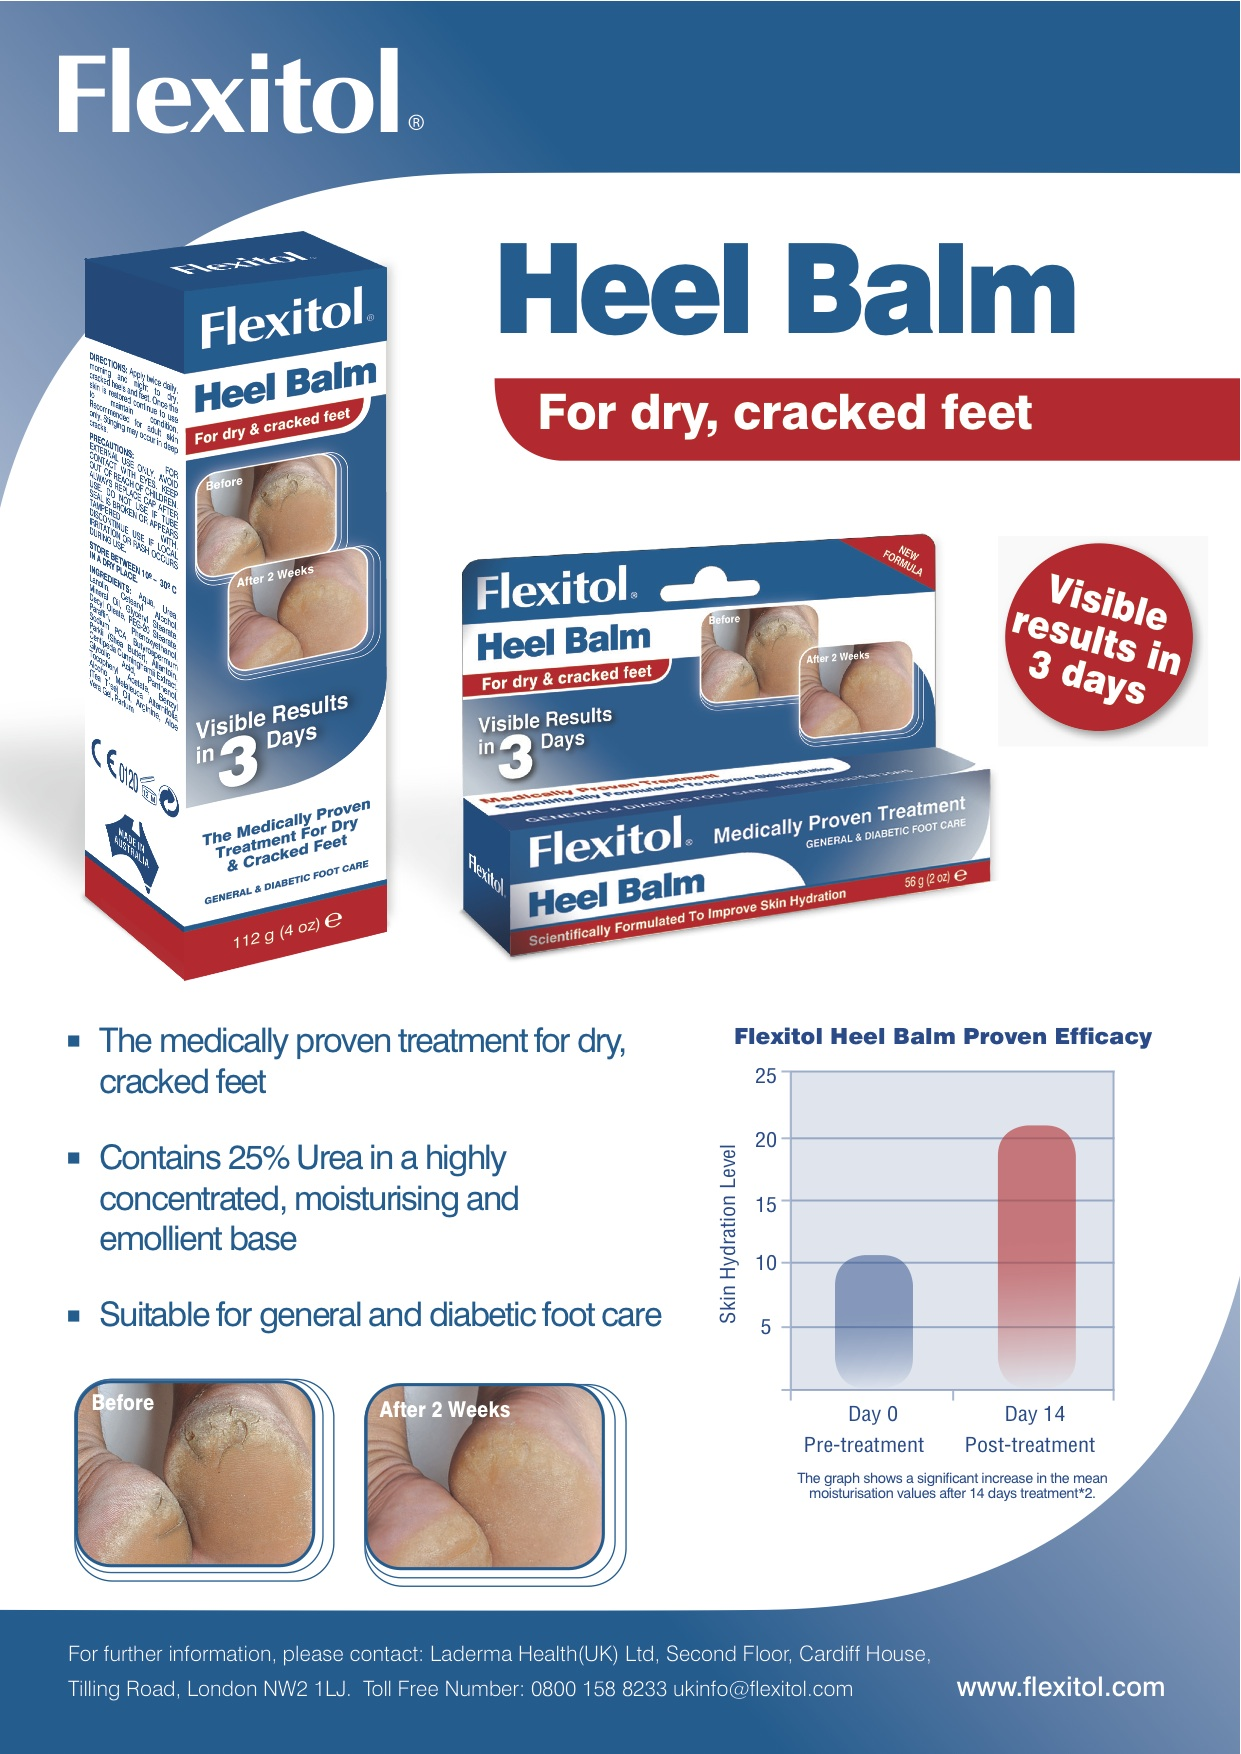 Flexitol: Saving Our Skin